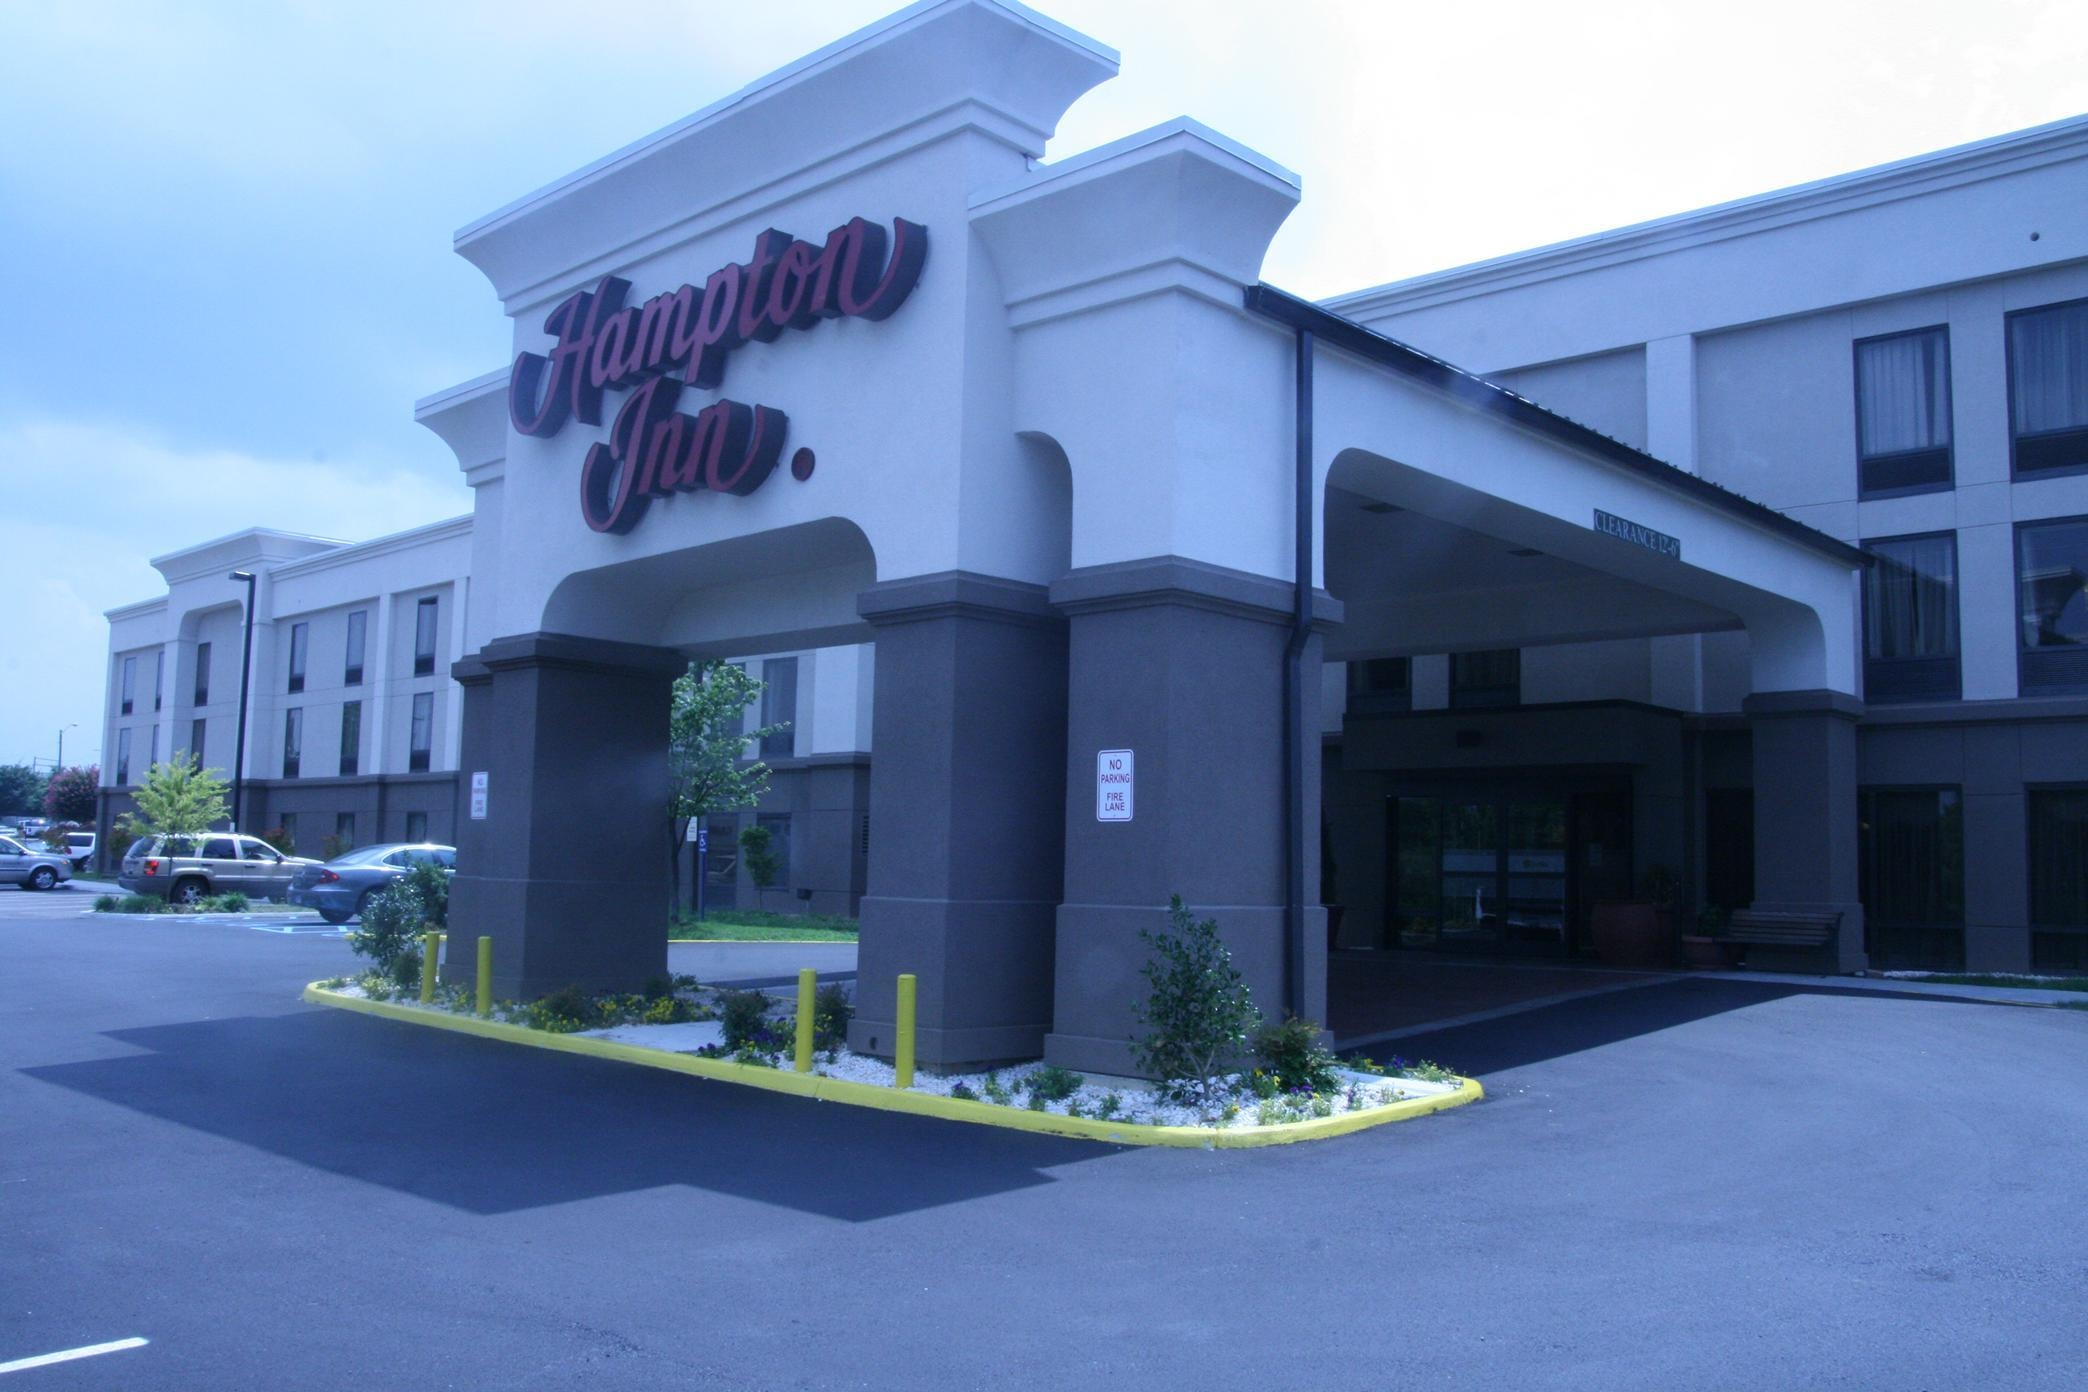 Hampton Inn Roanoke/Hollins - I-81 image 0